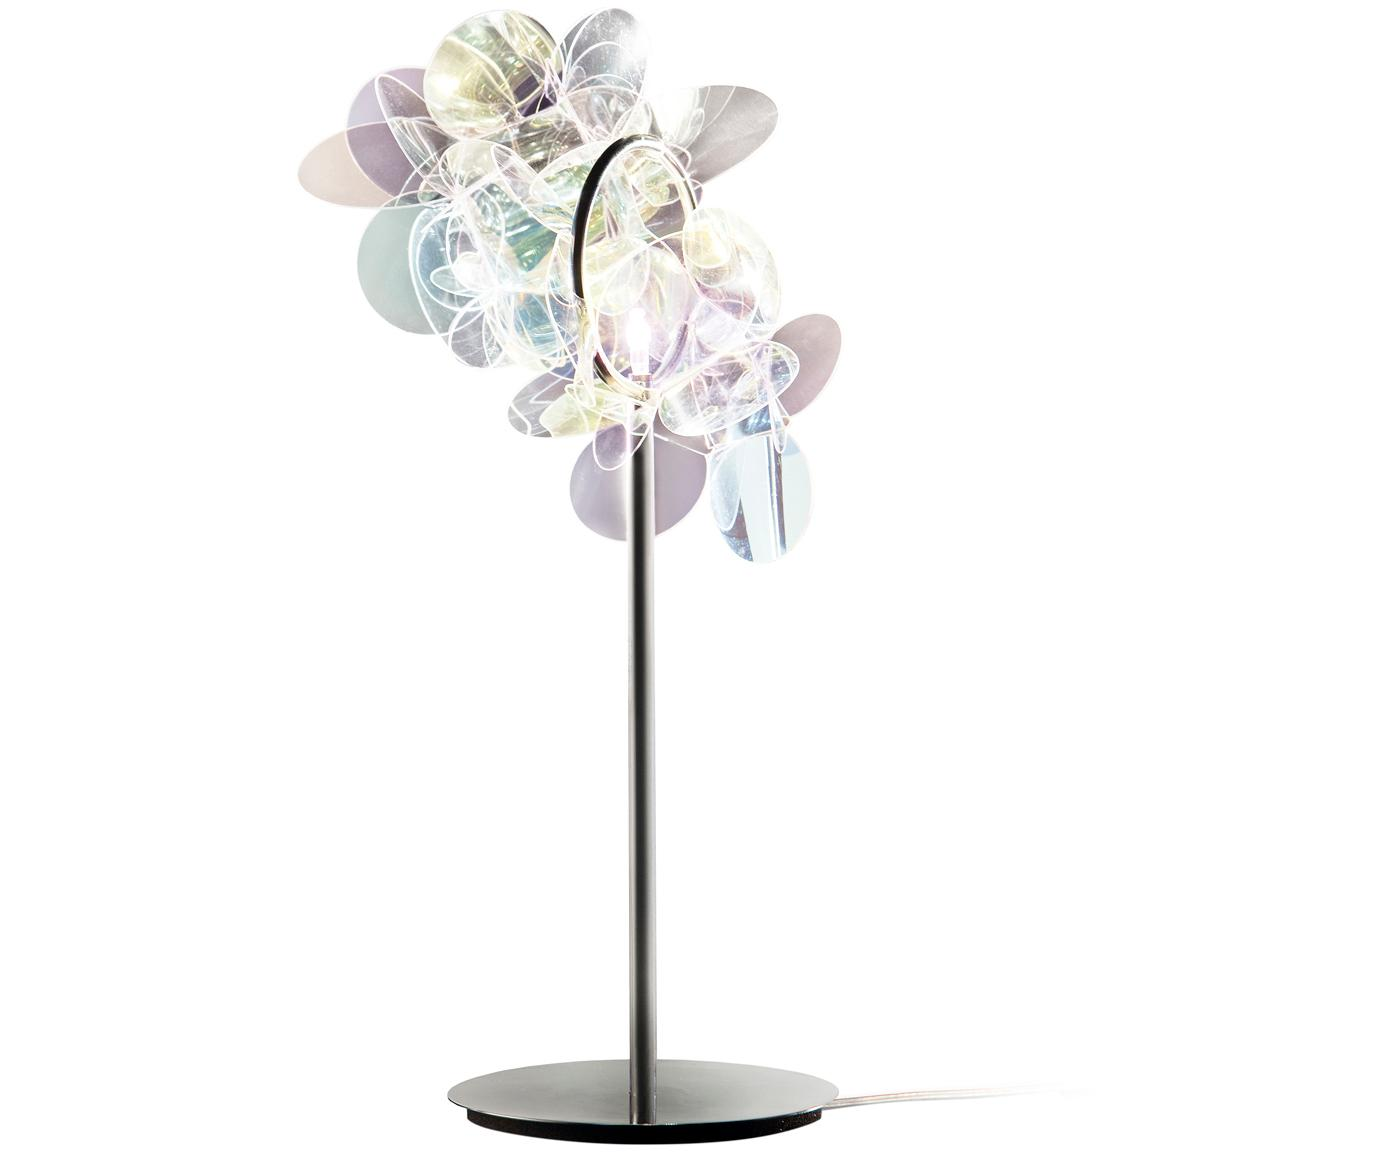 Tafellamp Mille Bolle, Lampenkap: technopolymeer Cristalfle, Lampvoet: edelstaal, Multicolour, 22 x 41 cm